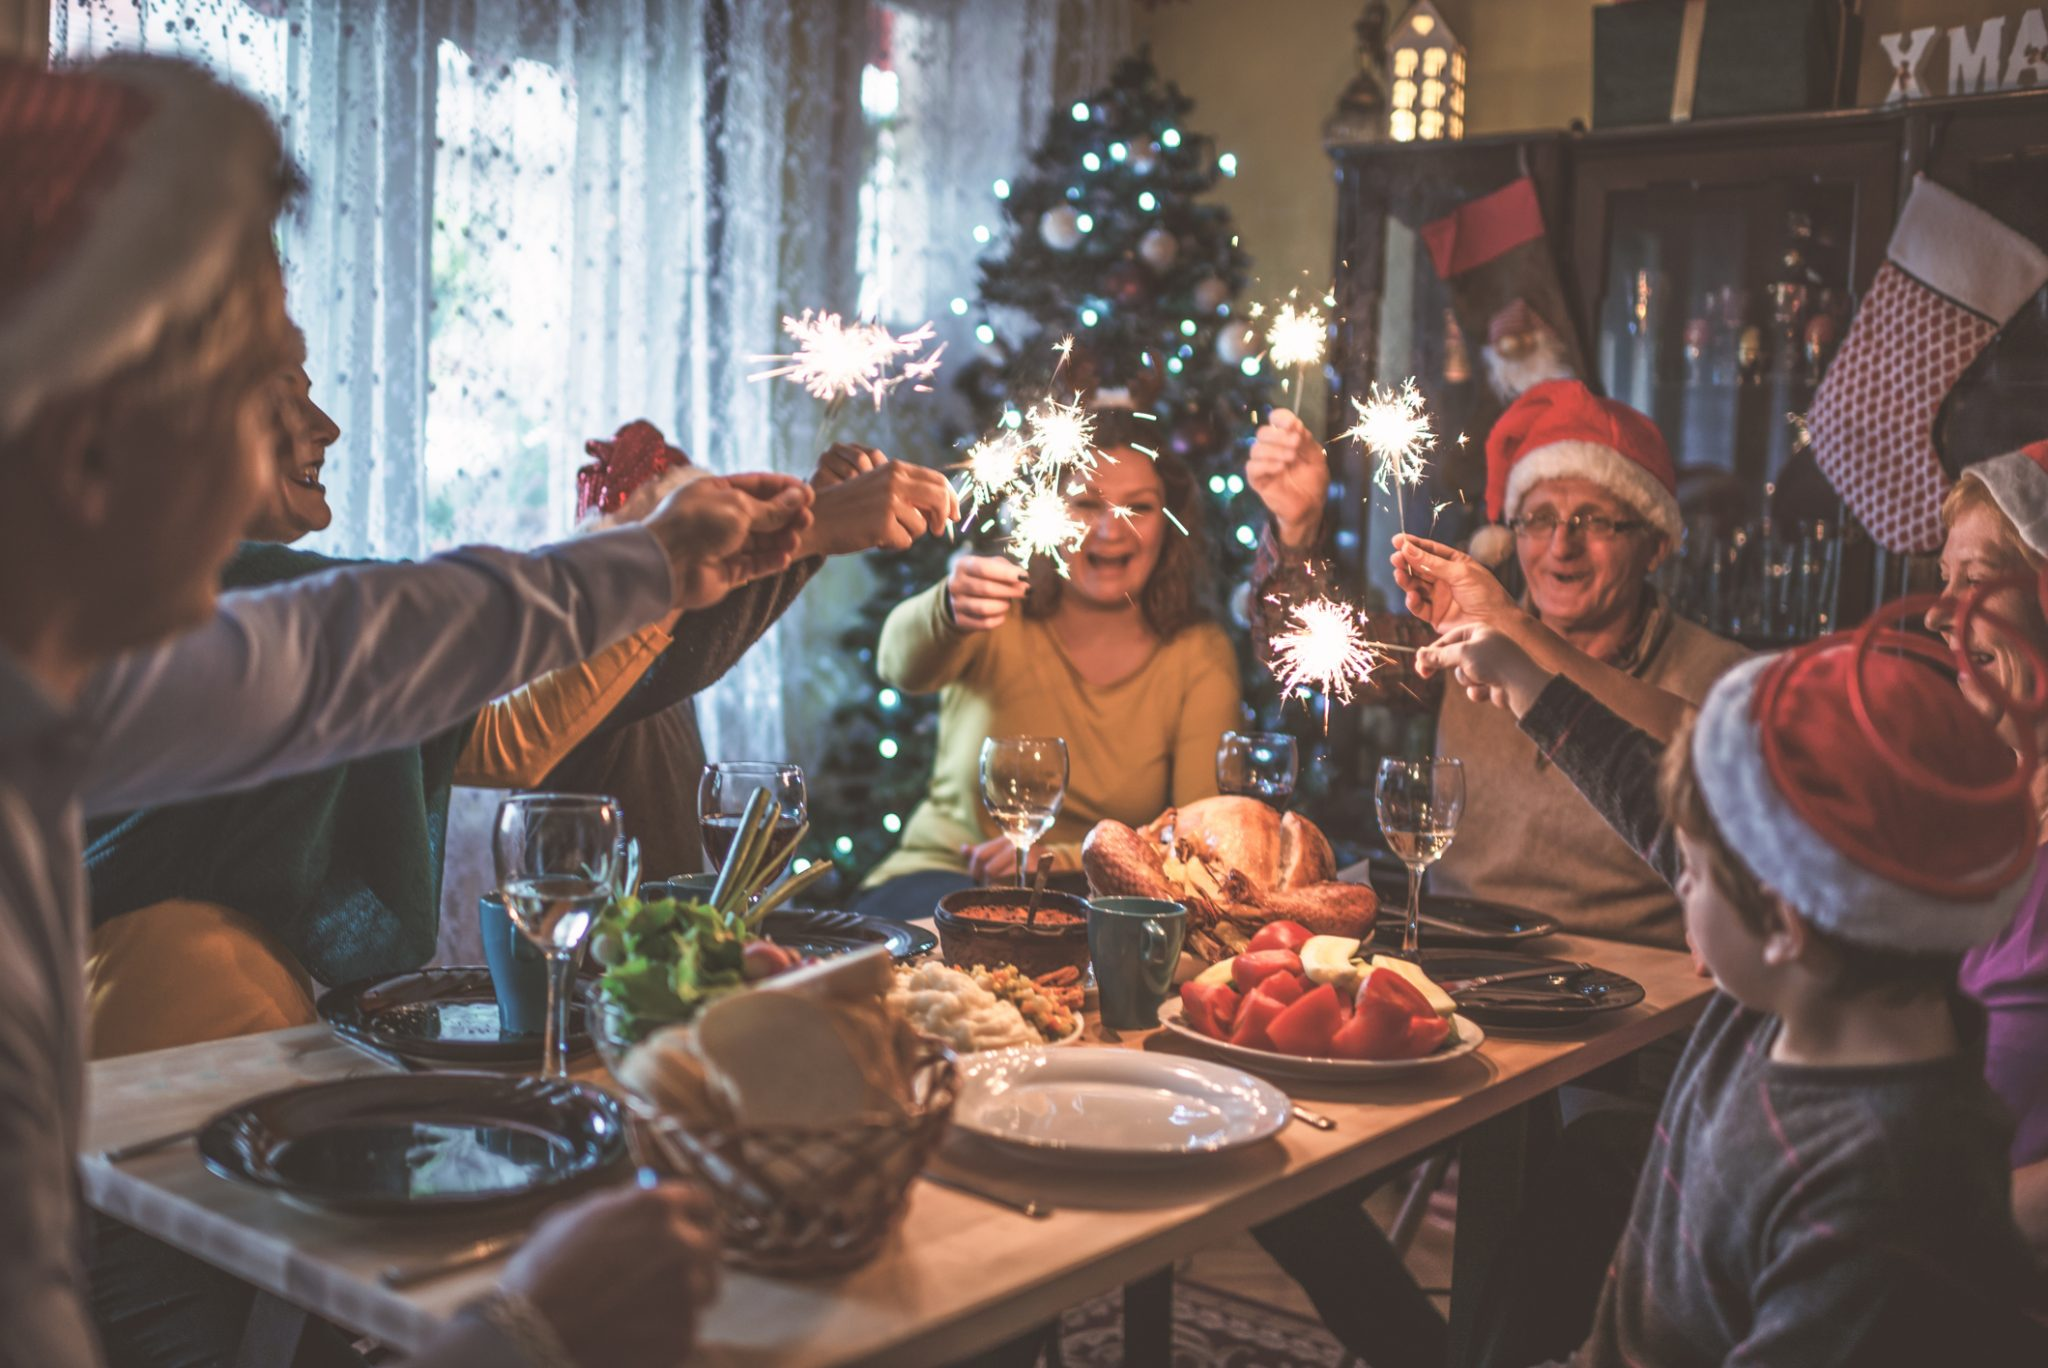 Christmas Meal still brings Christmas Cheer